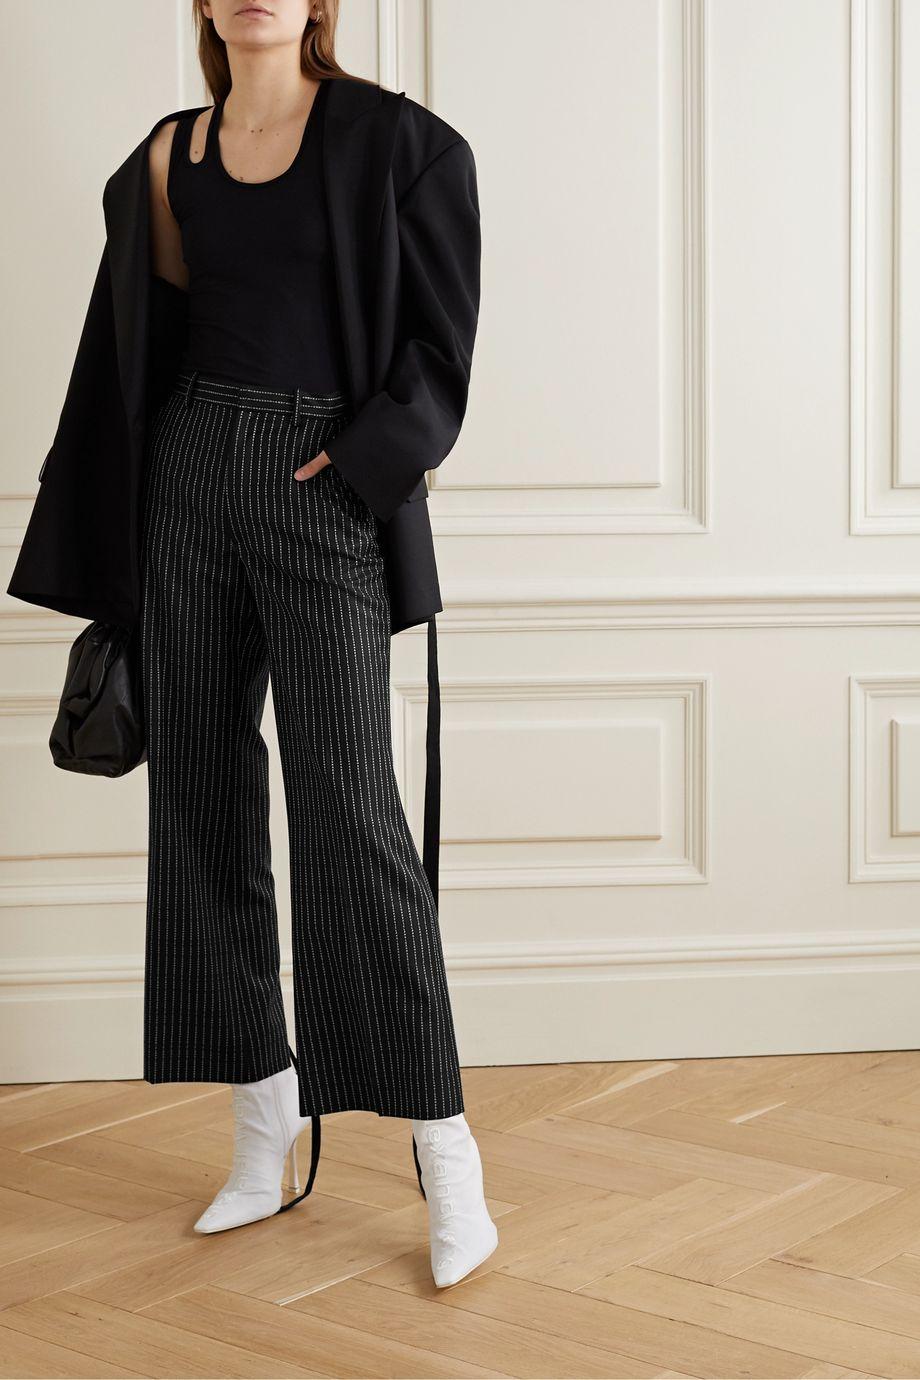 Maison Margiela 羊毛提花九分阔腿裤